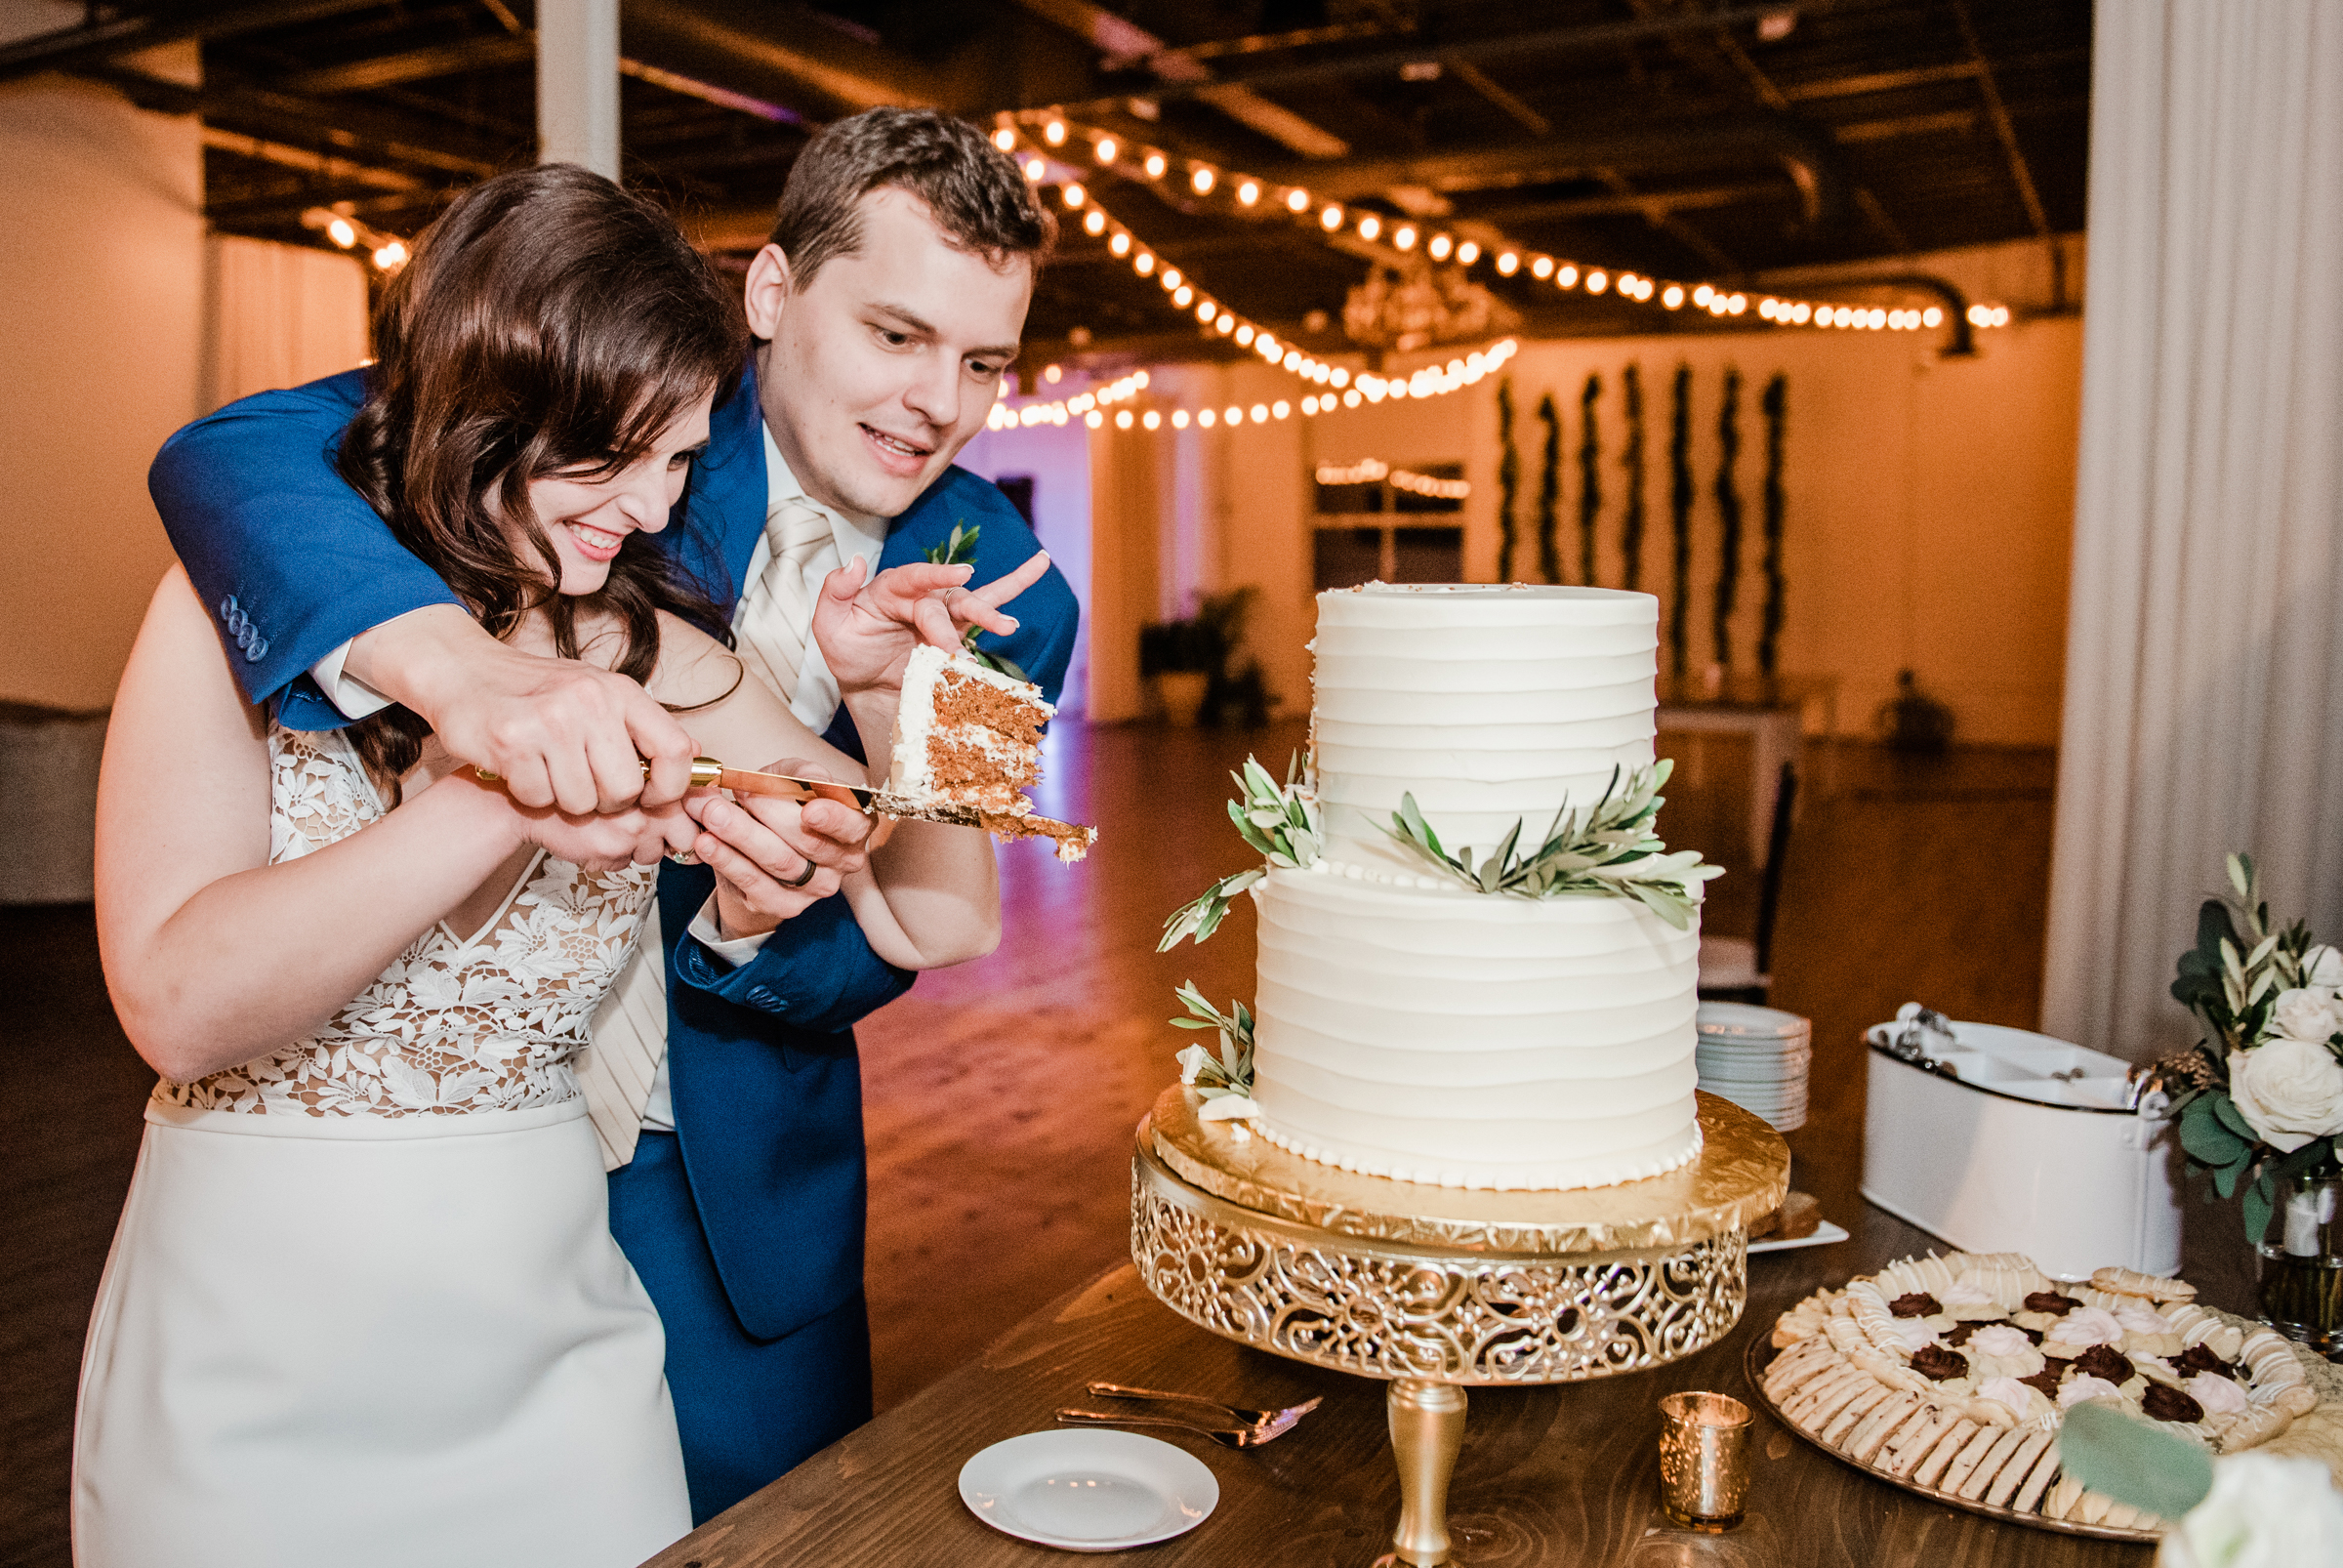 The_Arbor_LoftRochester_Wedding_JILL_STUDIO_Rochester_NY_Photographer_202253.jpg